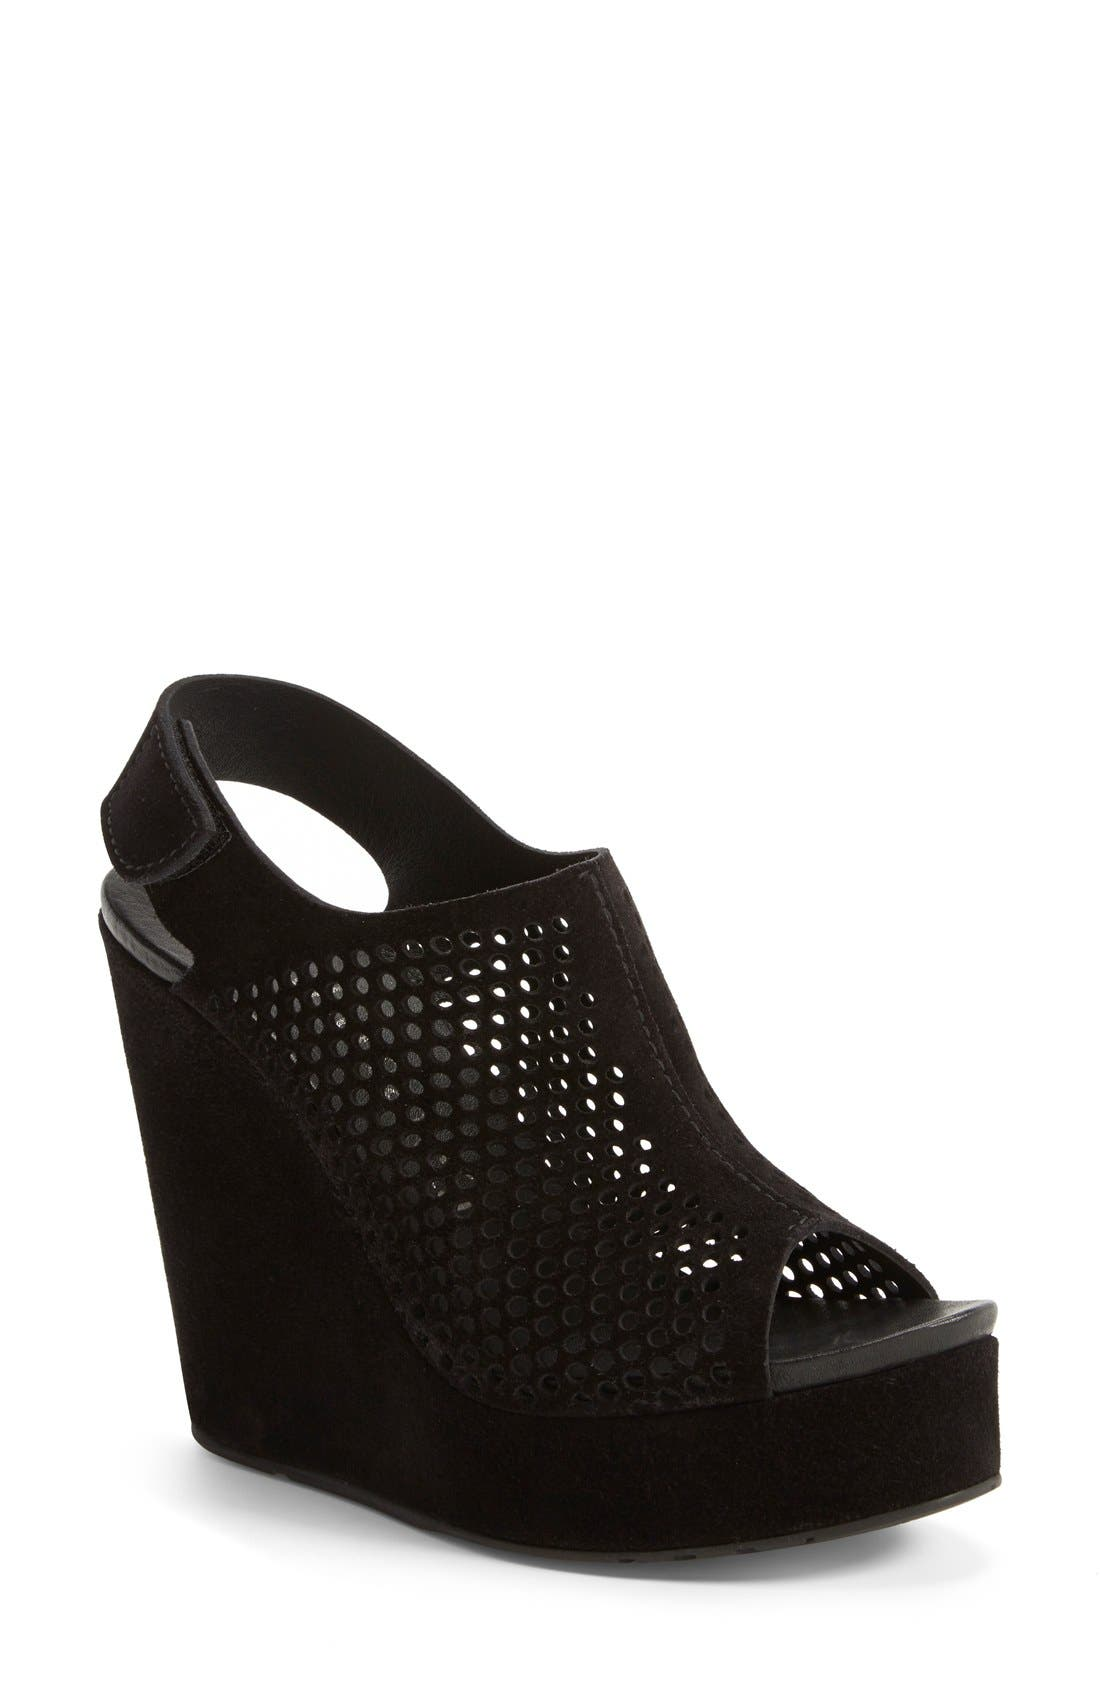 'Tonya' Perforated Wedge Bootie,                         Main,                         color, Black